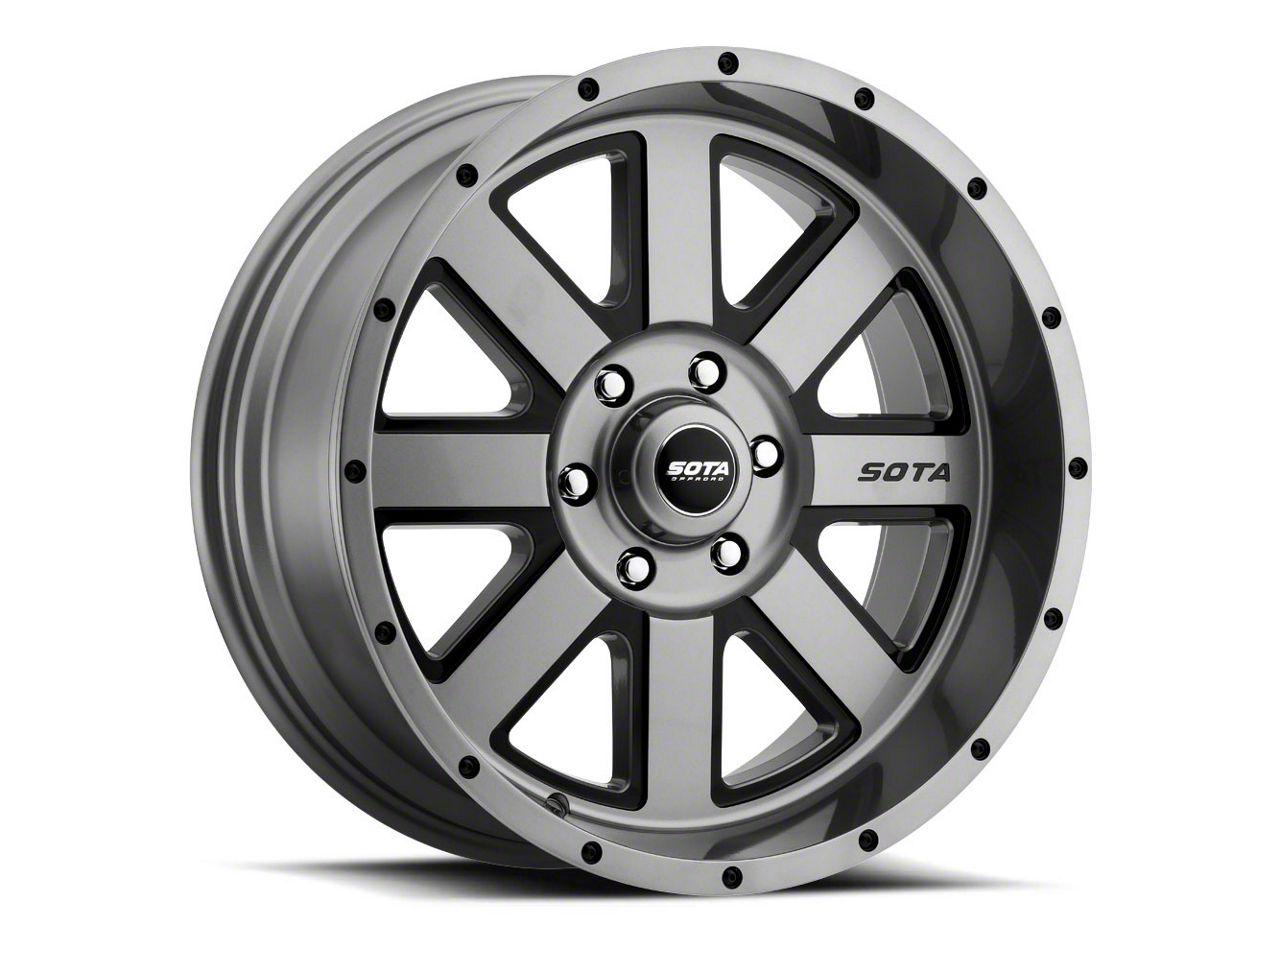 SOTA Off Road A.W.O.L. Anthra-Kote Black Wheel - 20x10 (18-19 Jeep Wrangler JL)